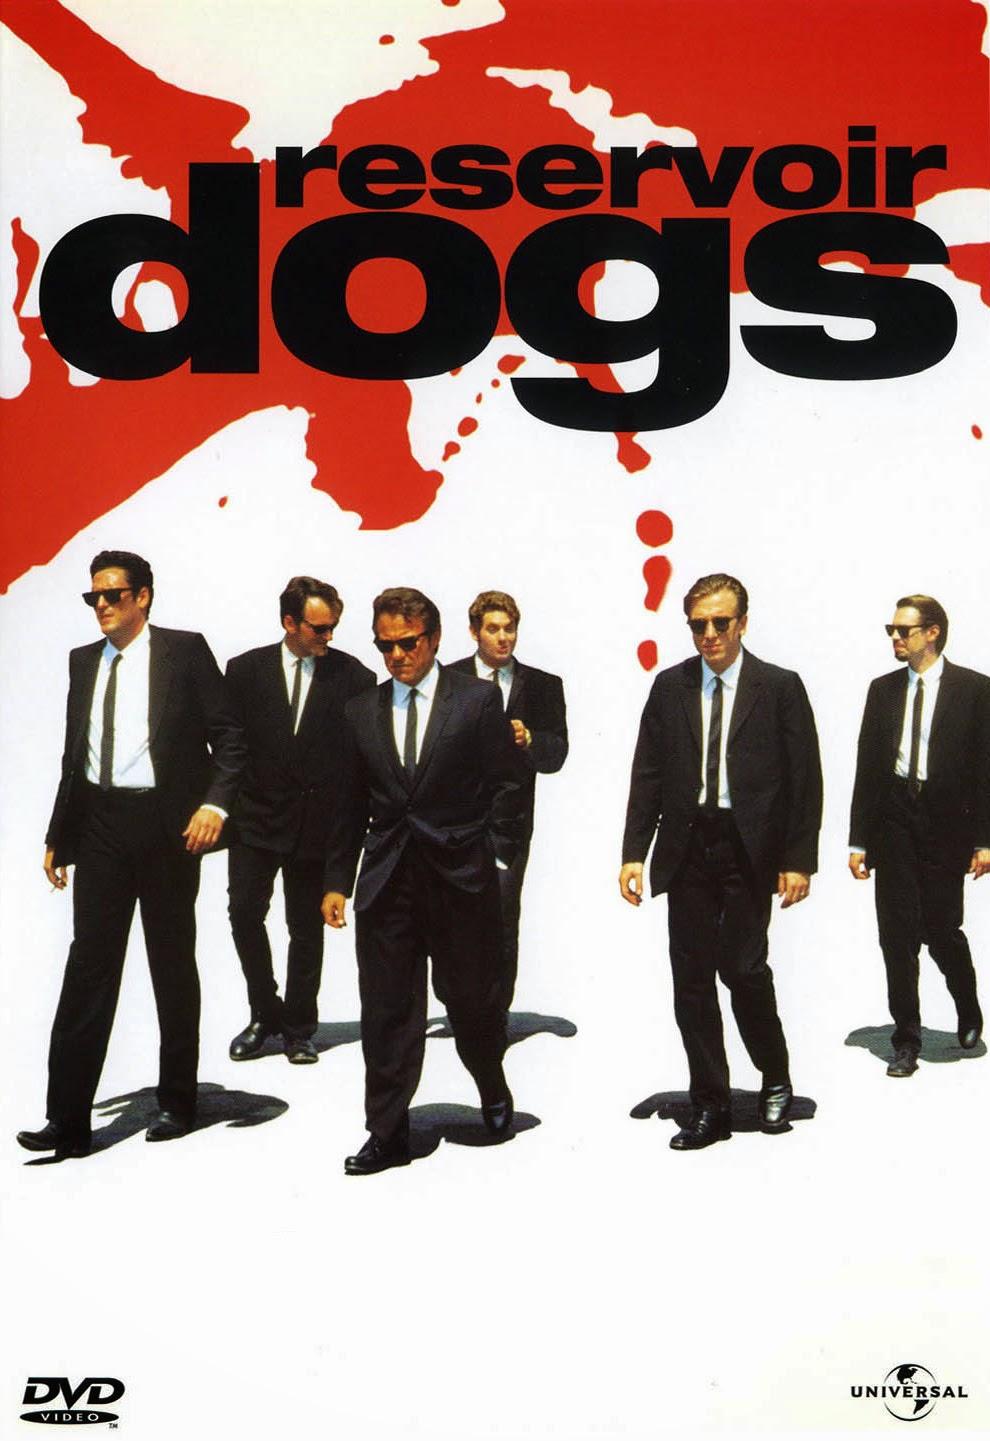 Reservoir Dogs Portada Quentin Tarantino Steve Buscemi Tim Roth fotogramailustrado